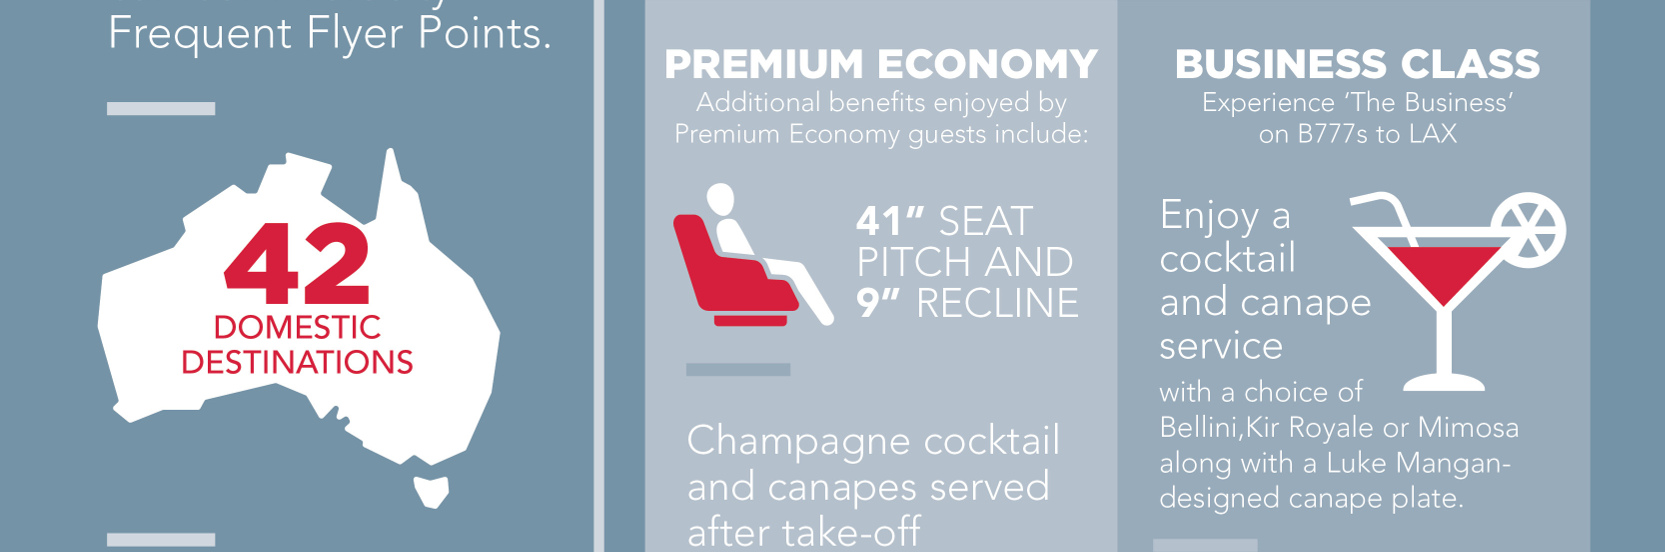 Fun Facts About Virgin Australia | Travel Associates